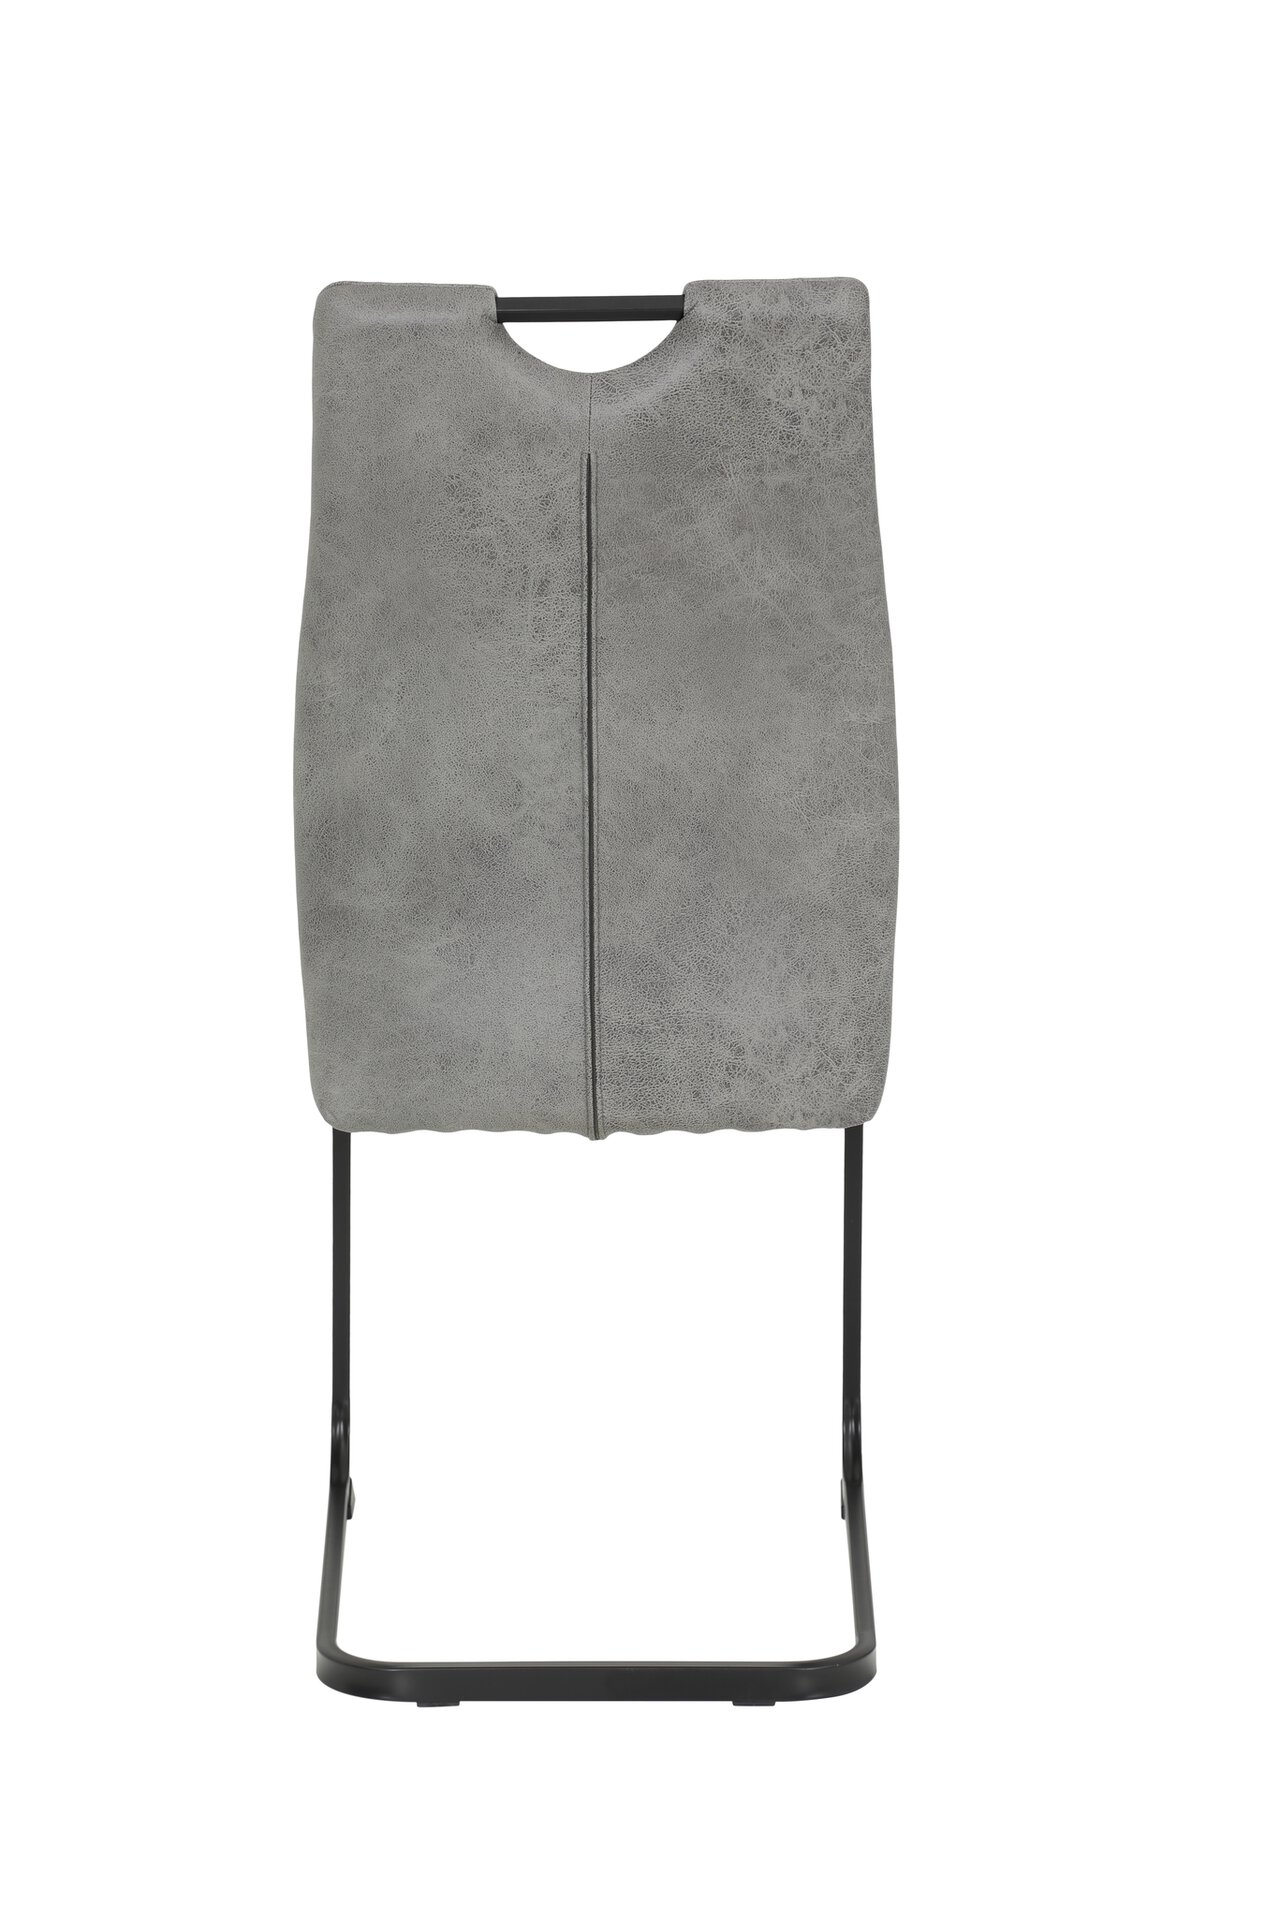 Freischwinger Adelina S SELF Textil 98 x 61 x 44 cm